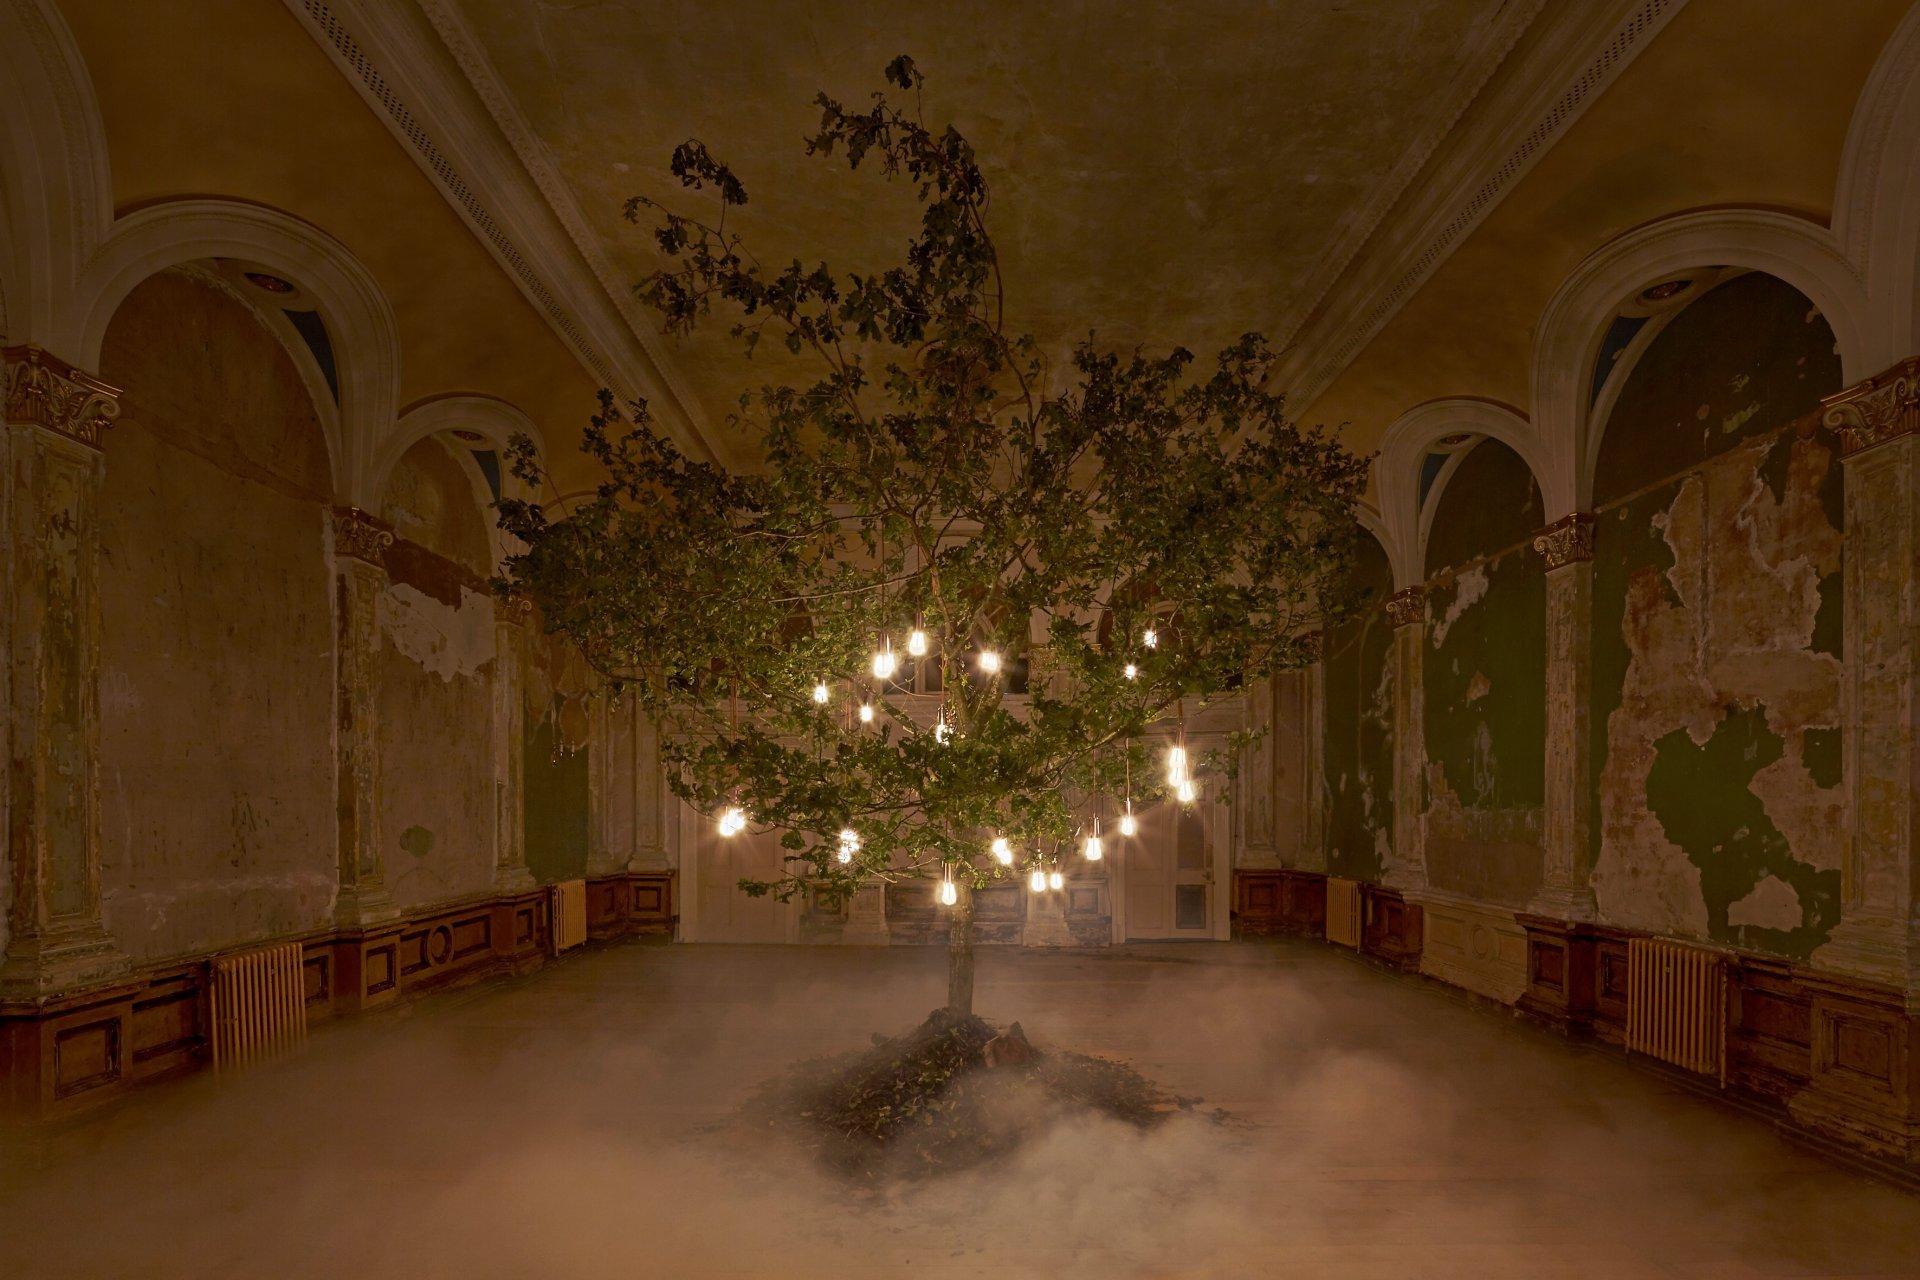 Plumen-Glowing-Oak-installation-at-Designersblock-2014-2 Glowing Oak Hulger